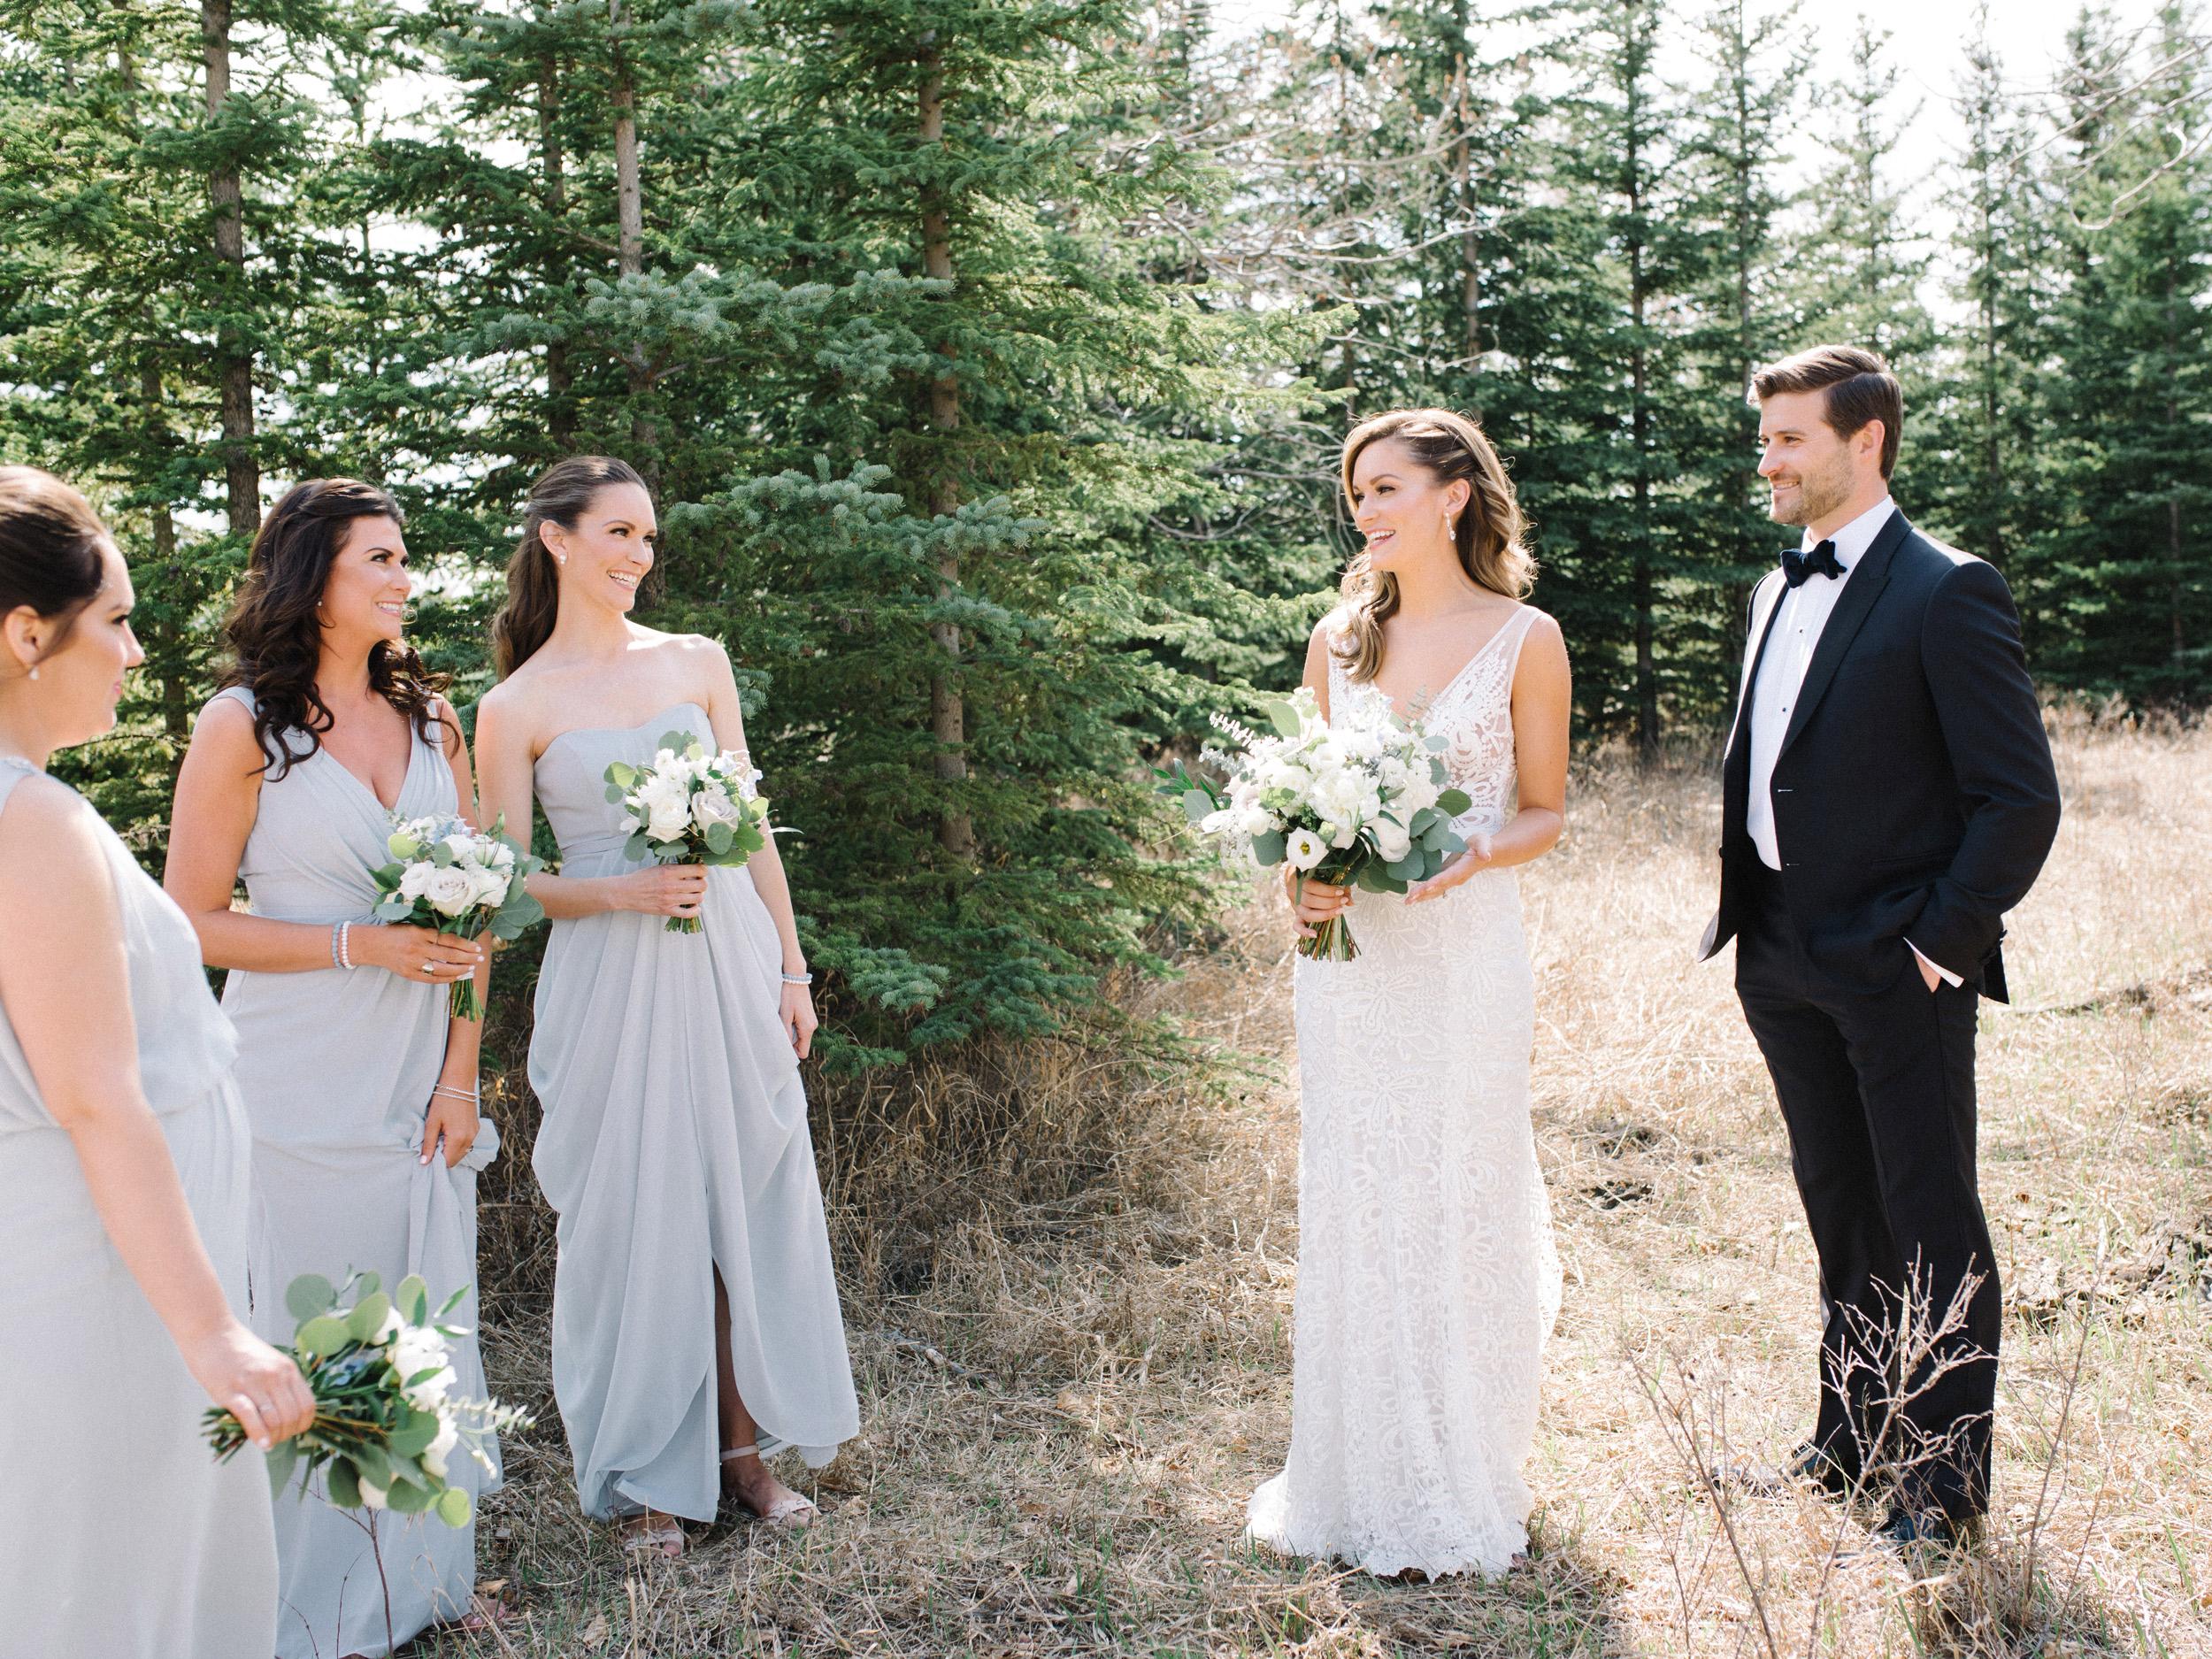 040-The_Lake_House_Calgary_Wedding.jpg